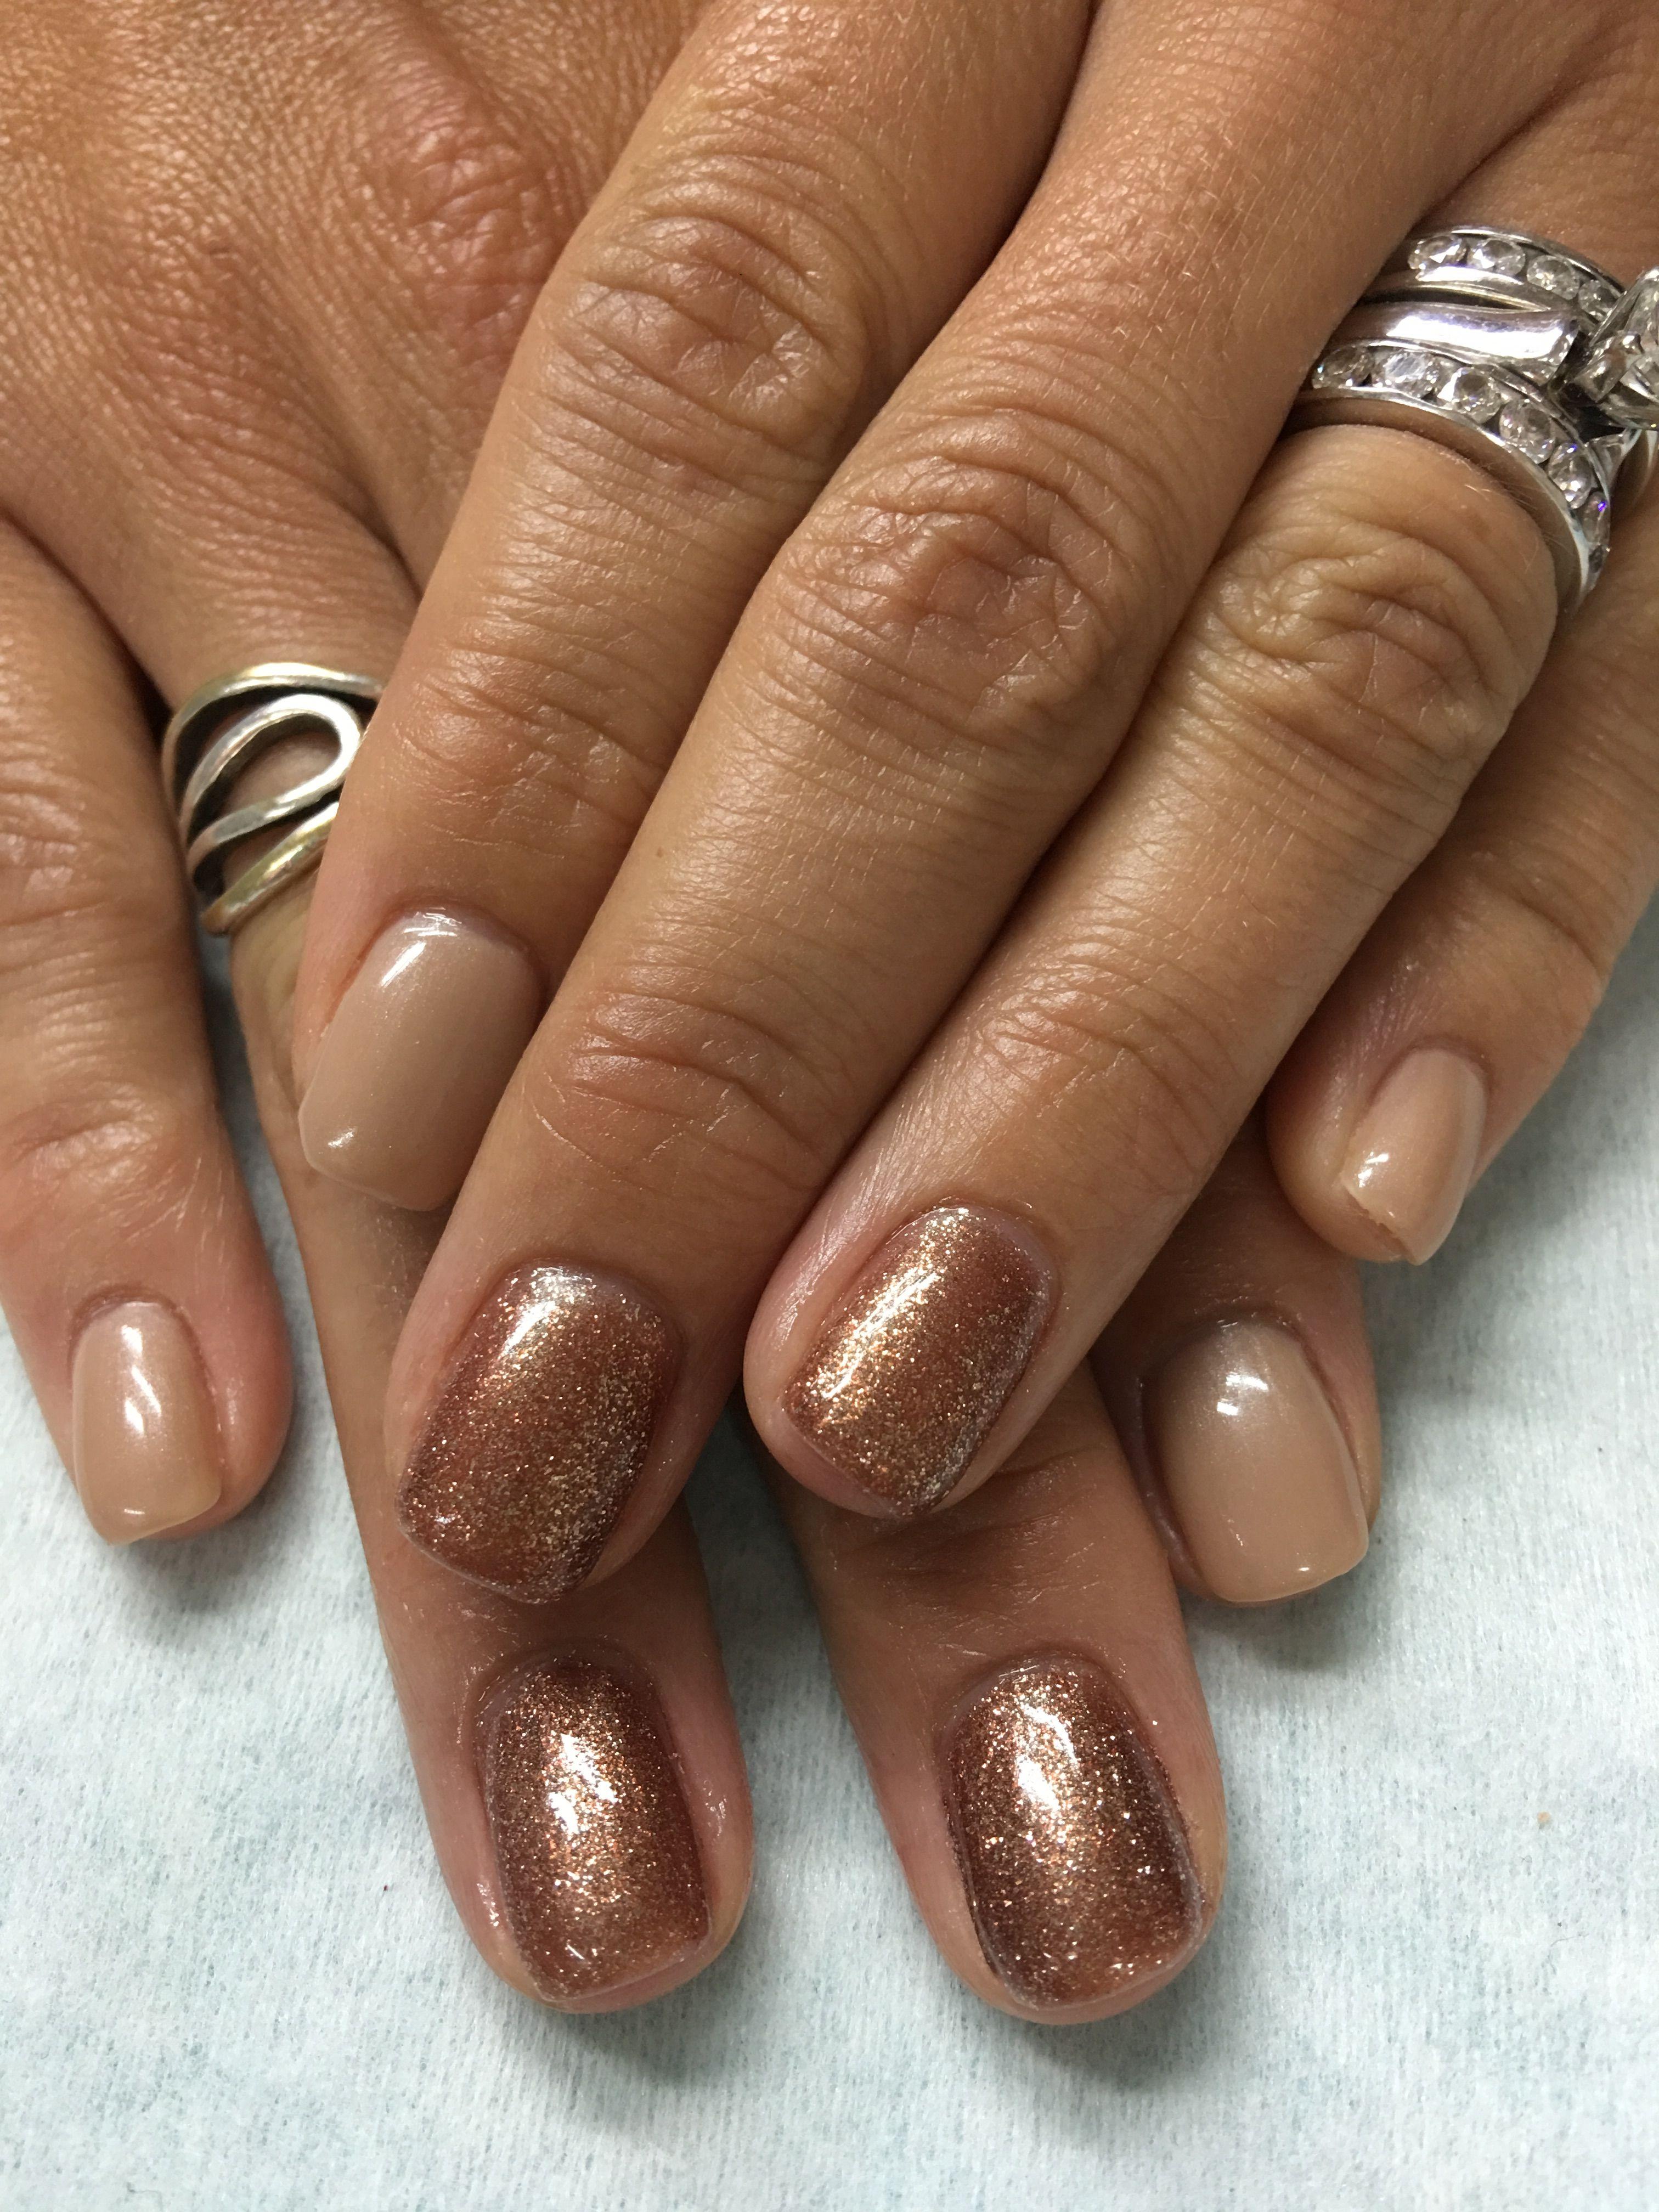 Tan/Beige Copper Fall Glitter gel nails | Gel Nail designs ...